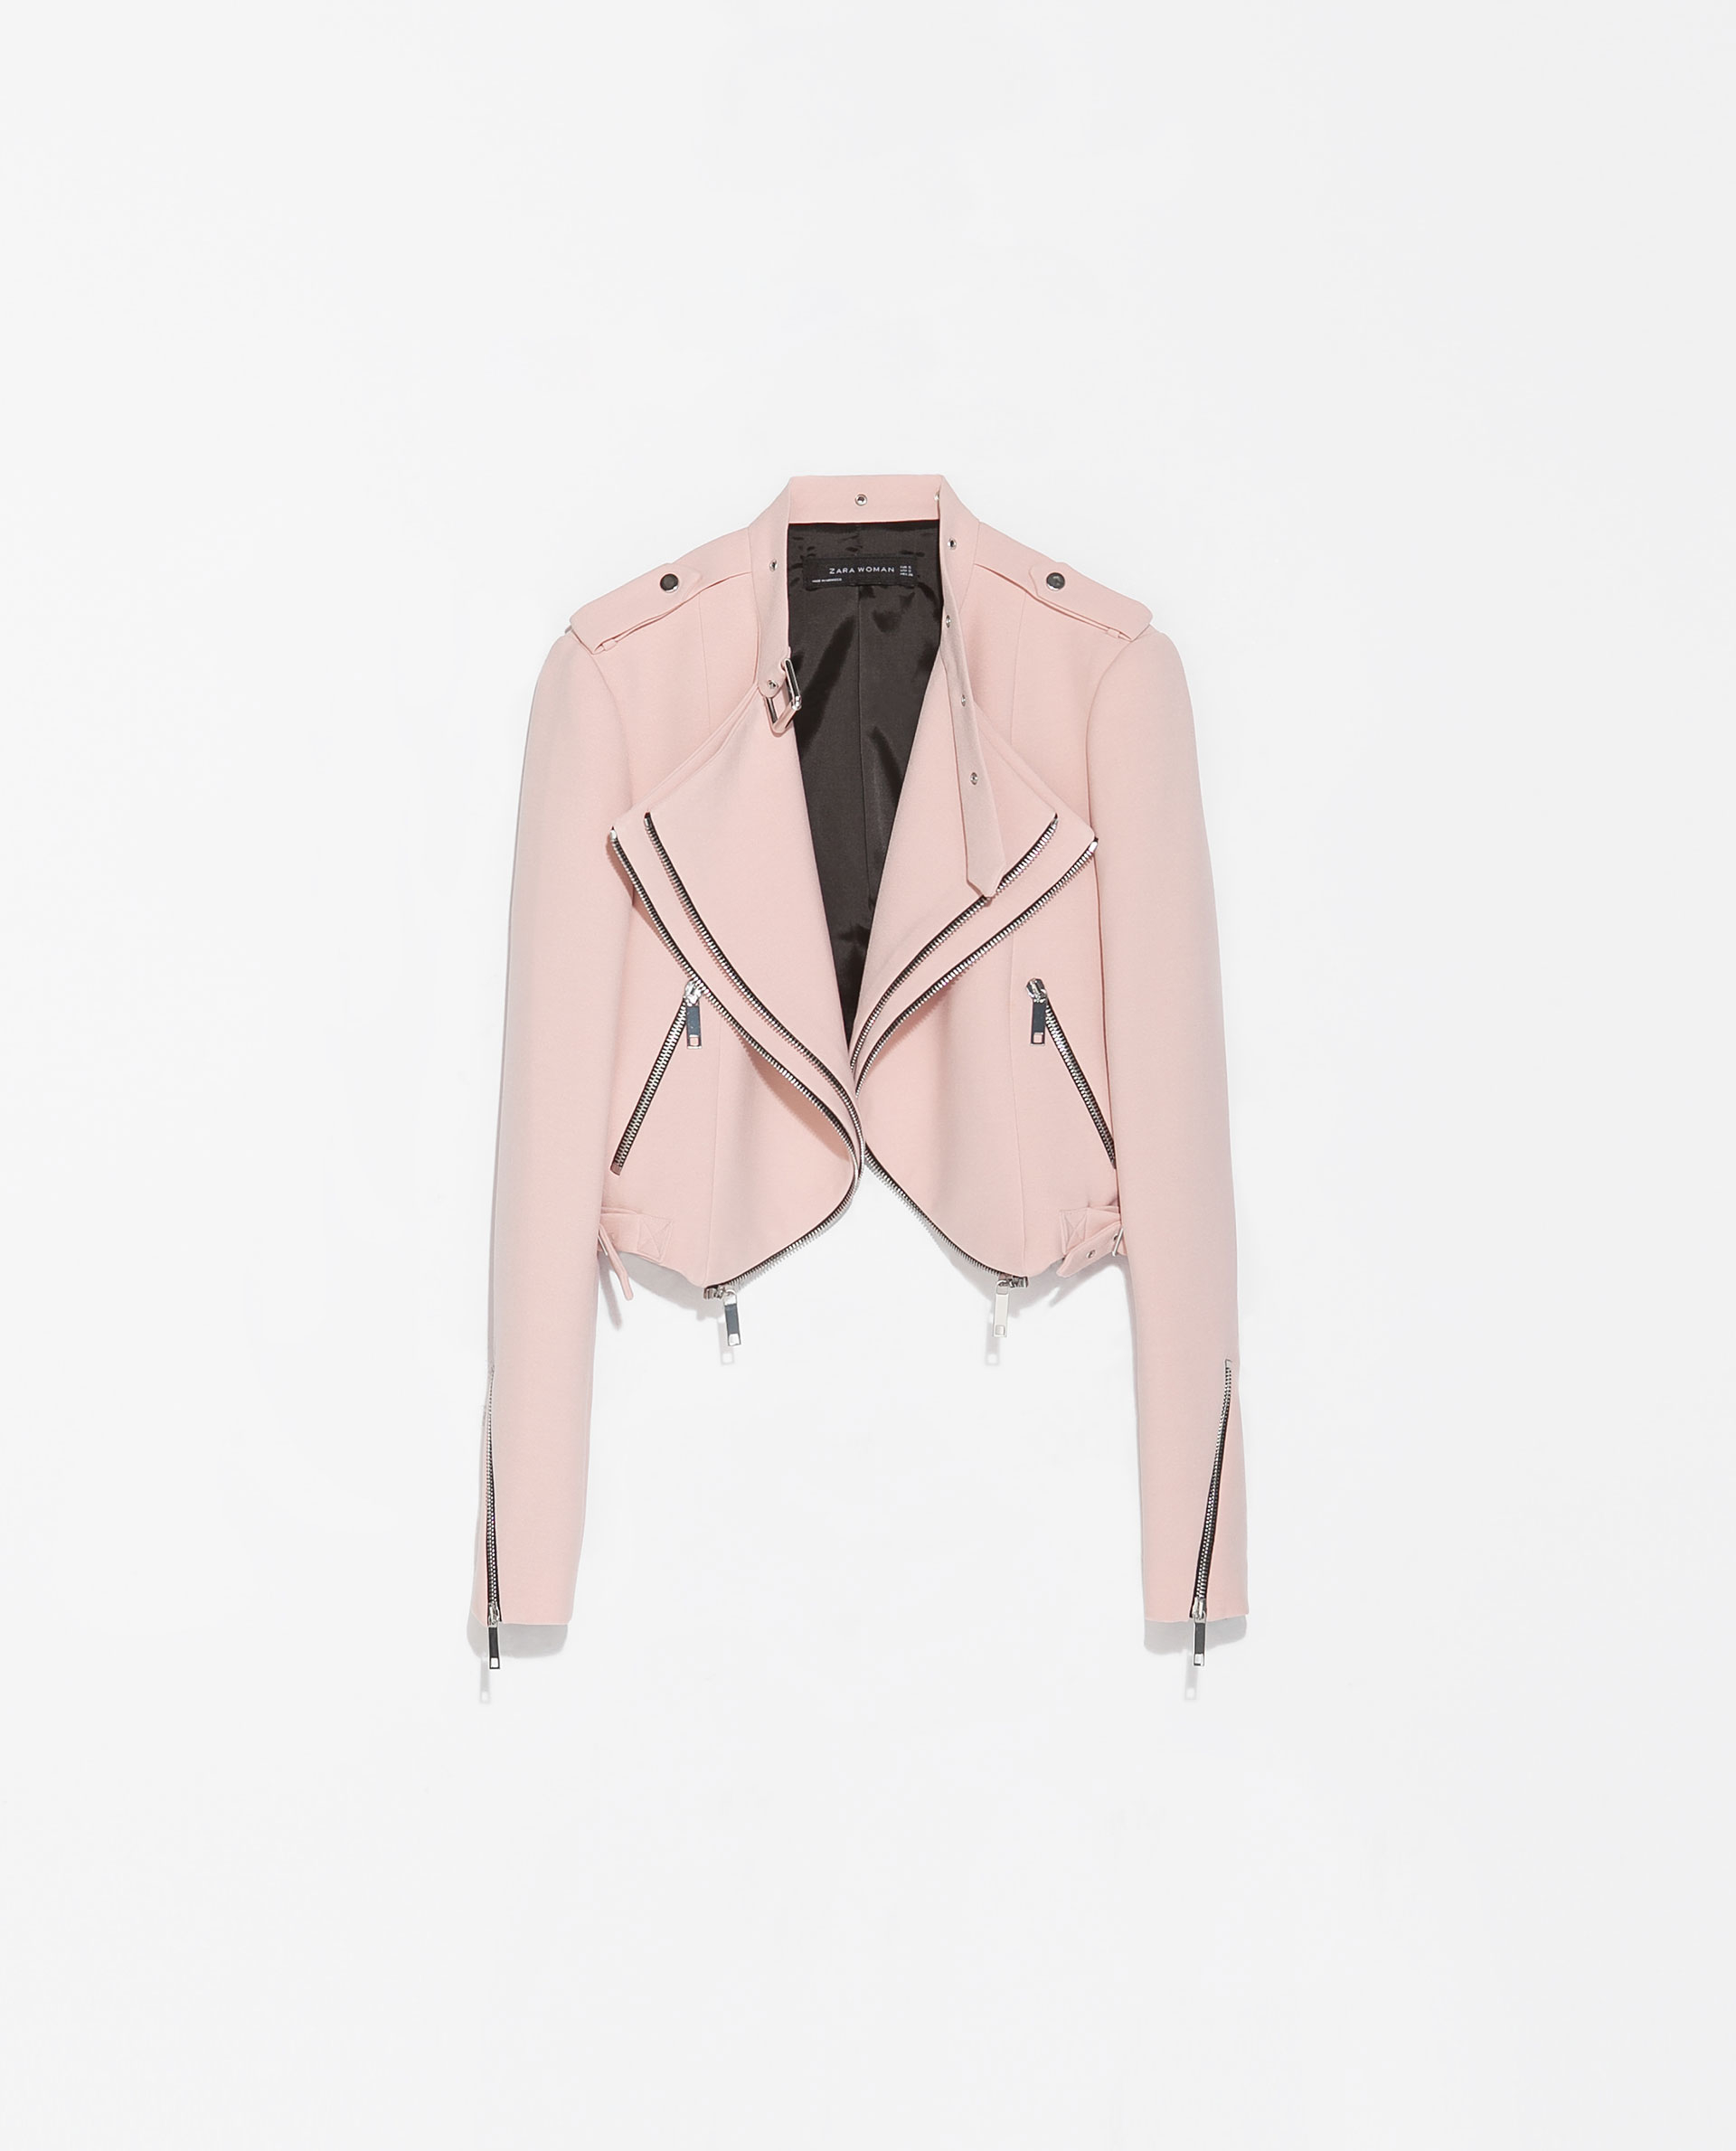 ec4027046ea601 ... Zara Cropped Jacket with Zips in Pink Lyst discount sale 63e27 ca763 ...